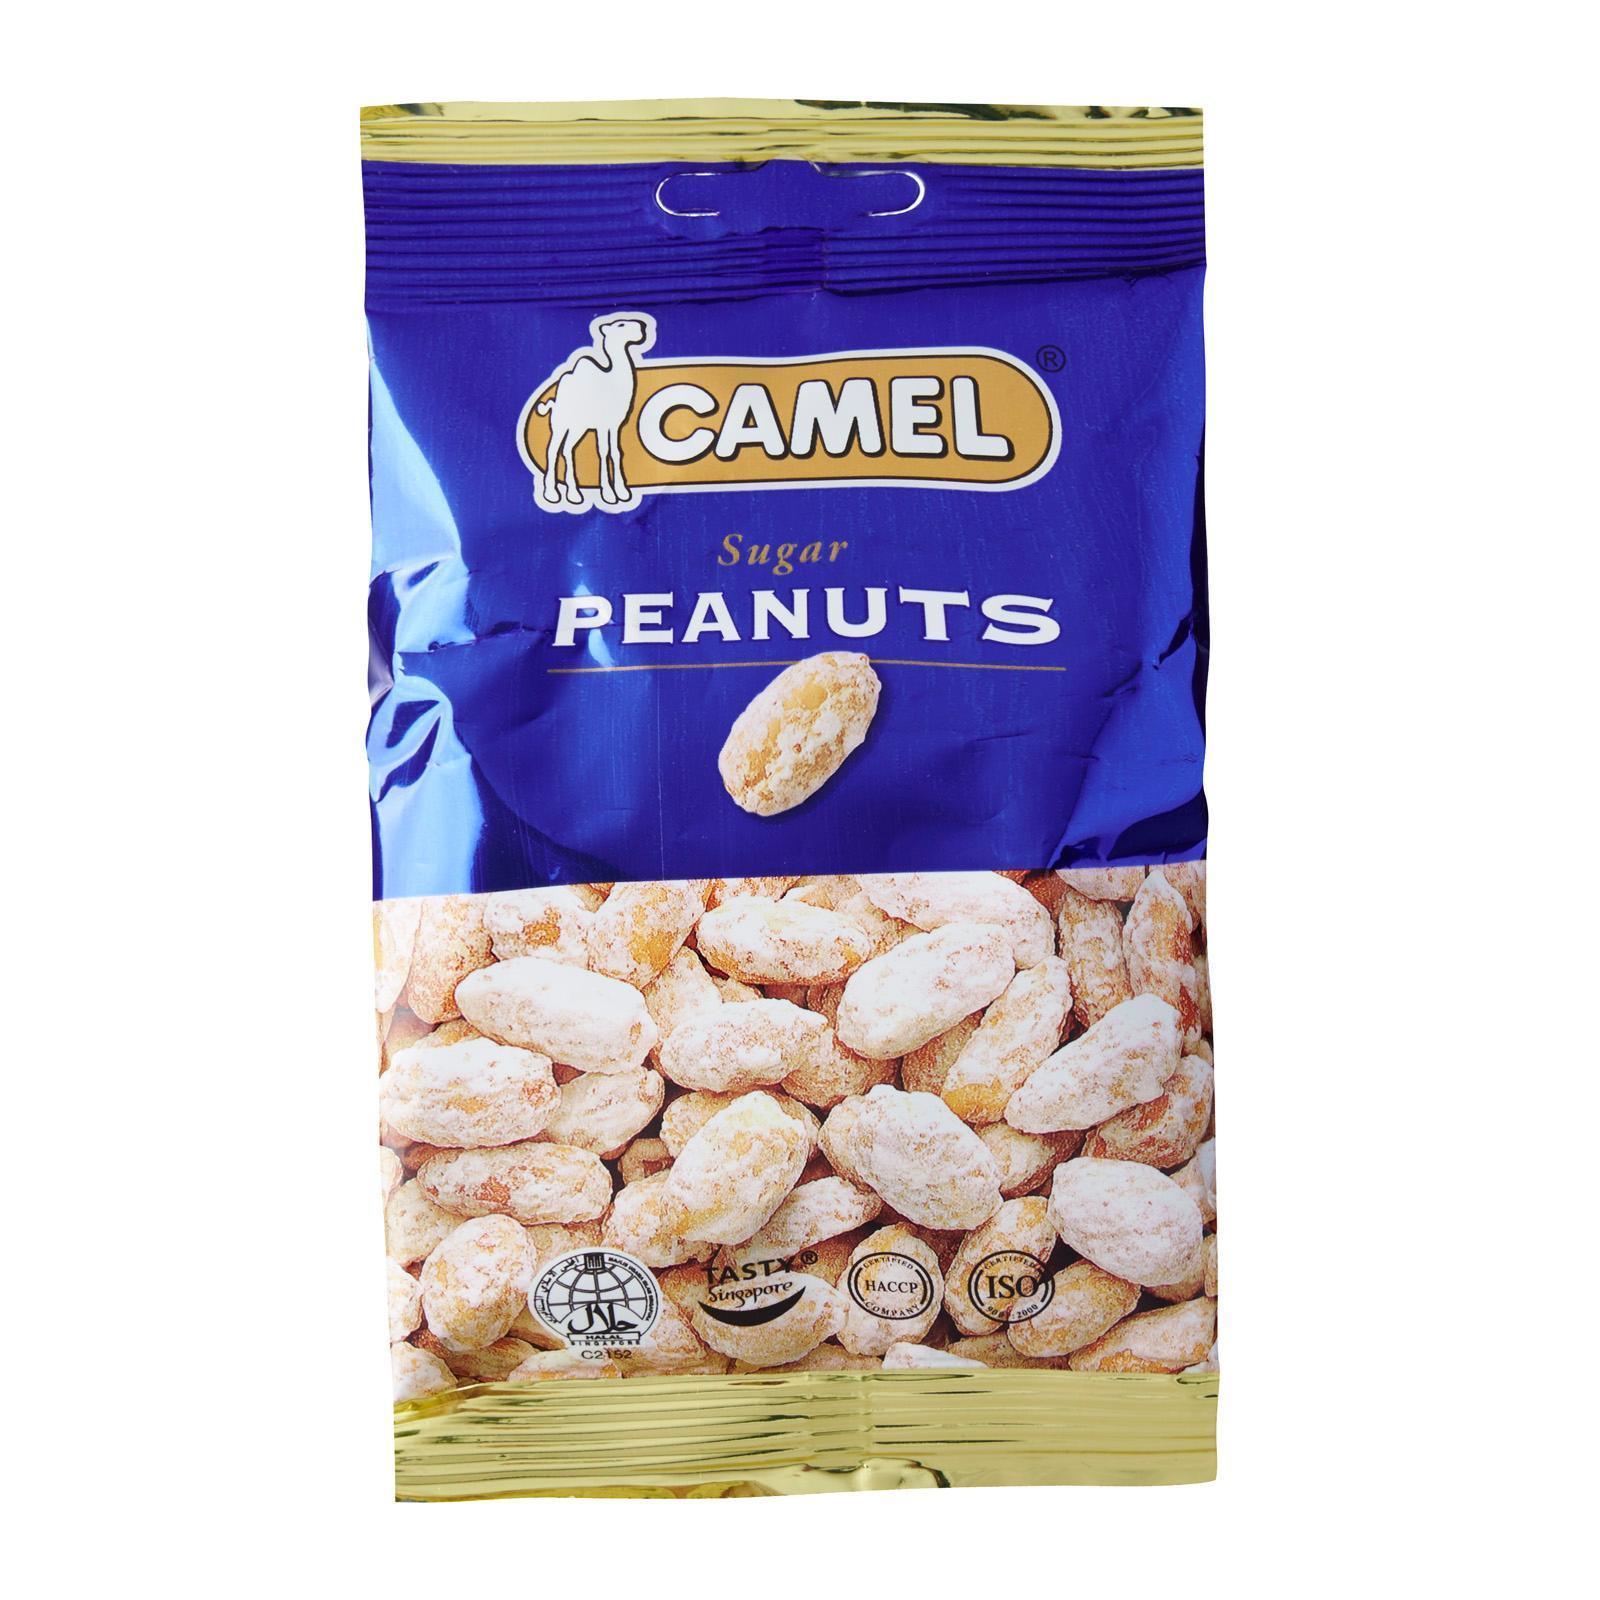 Camel Sugar Peanuts